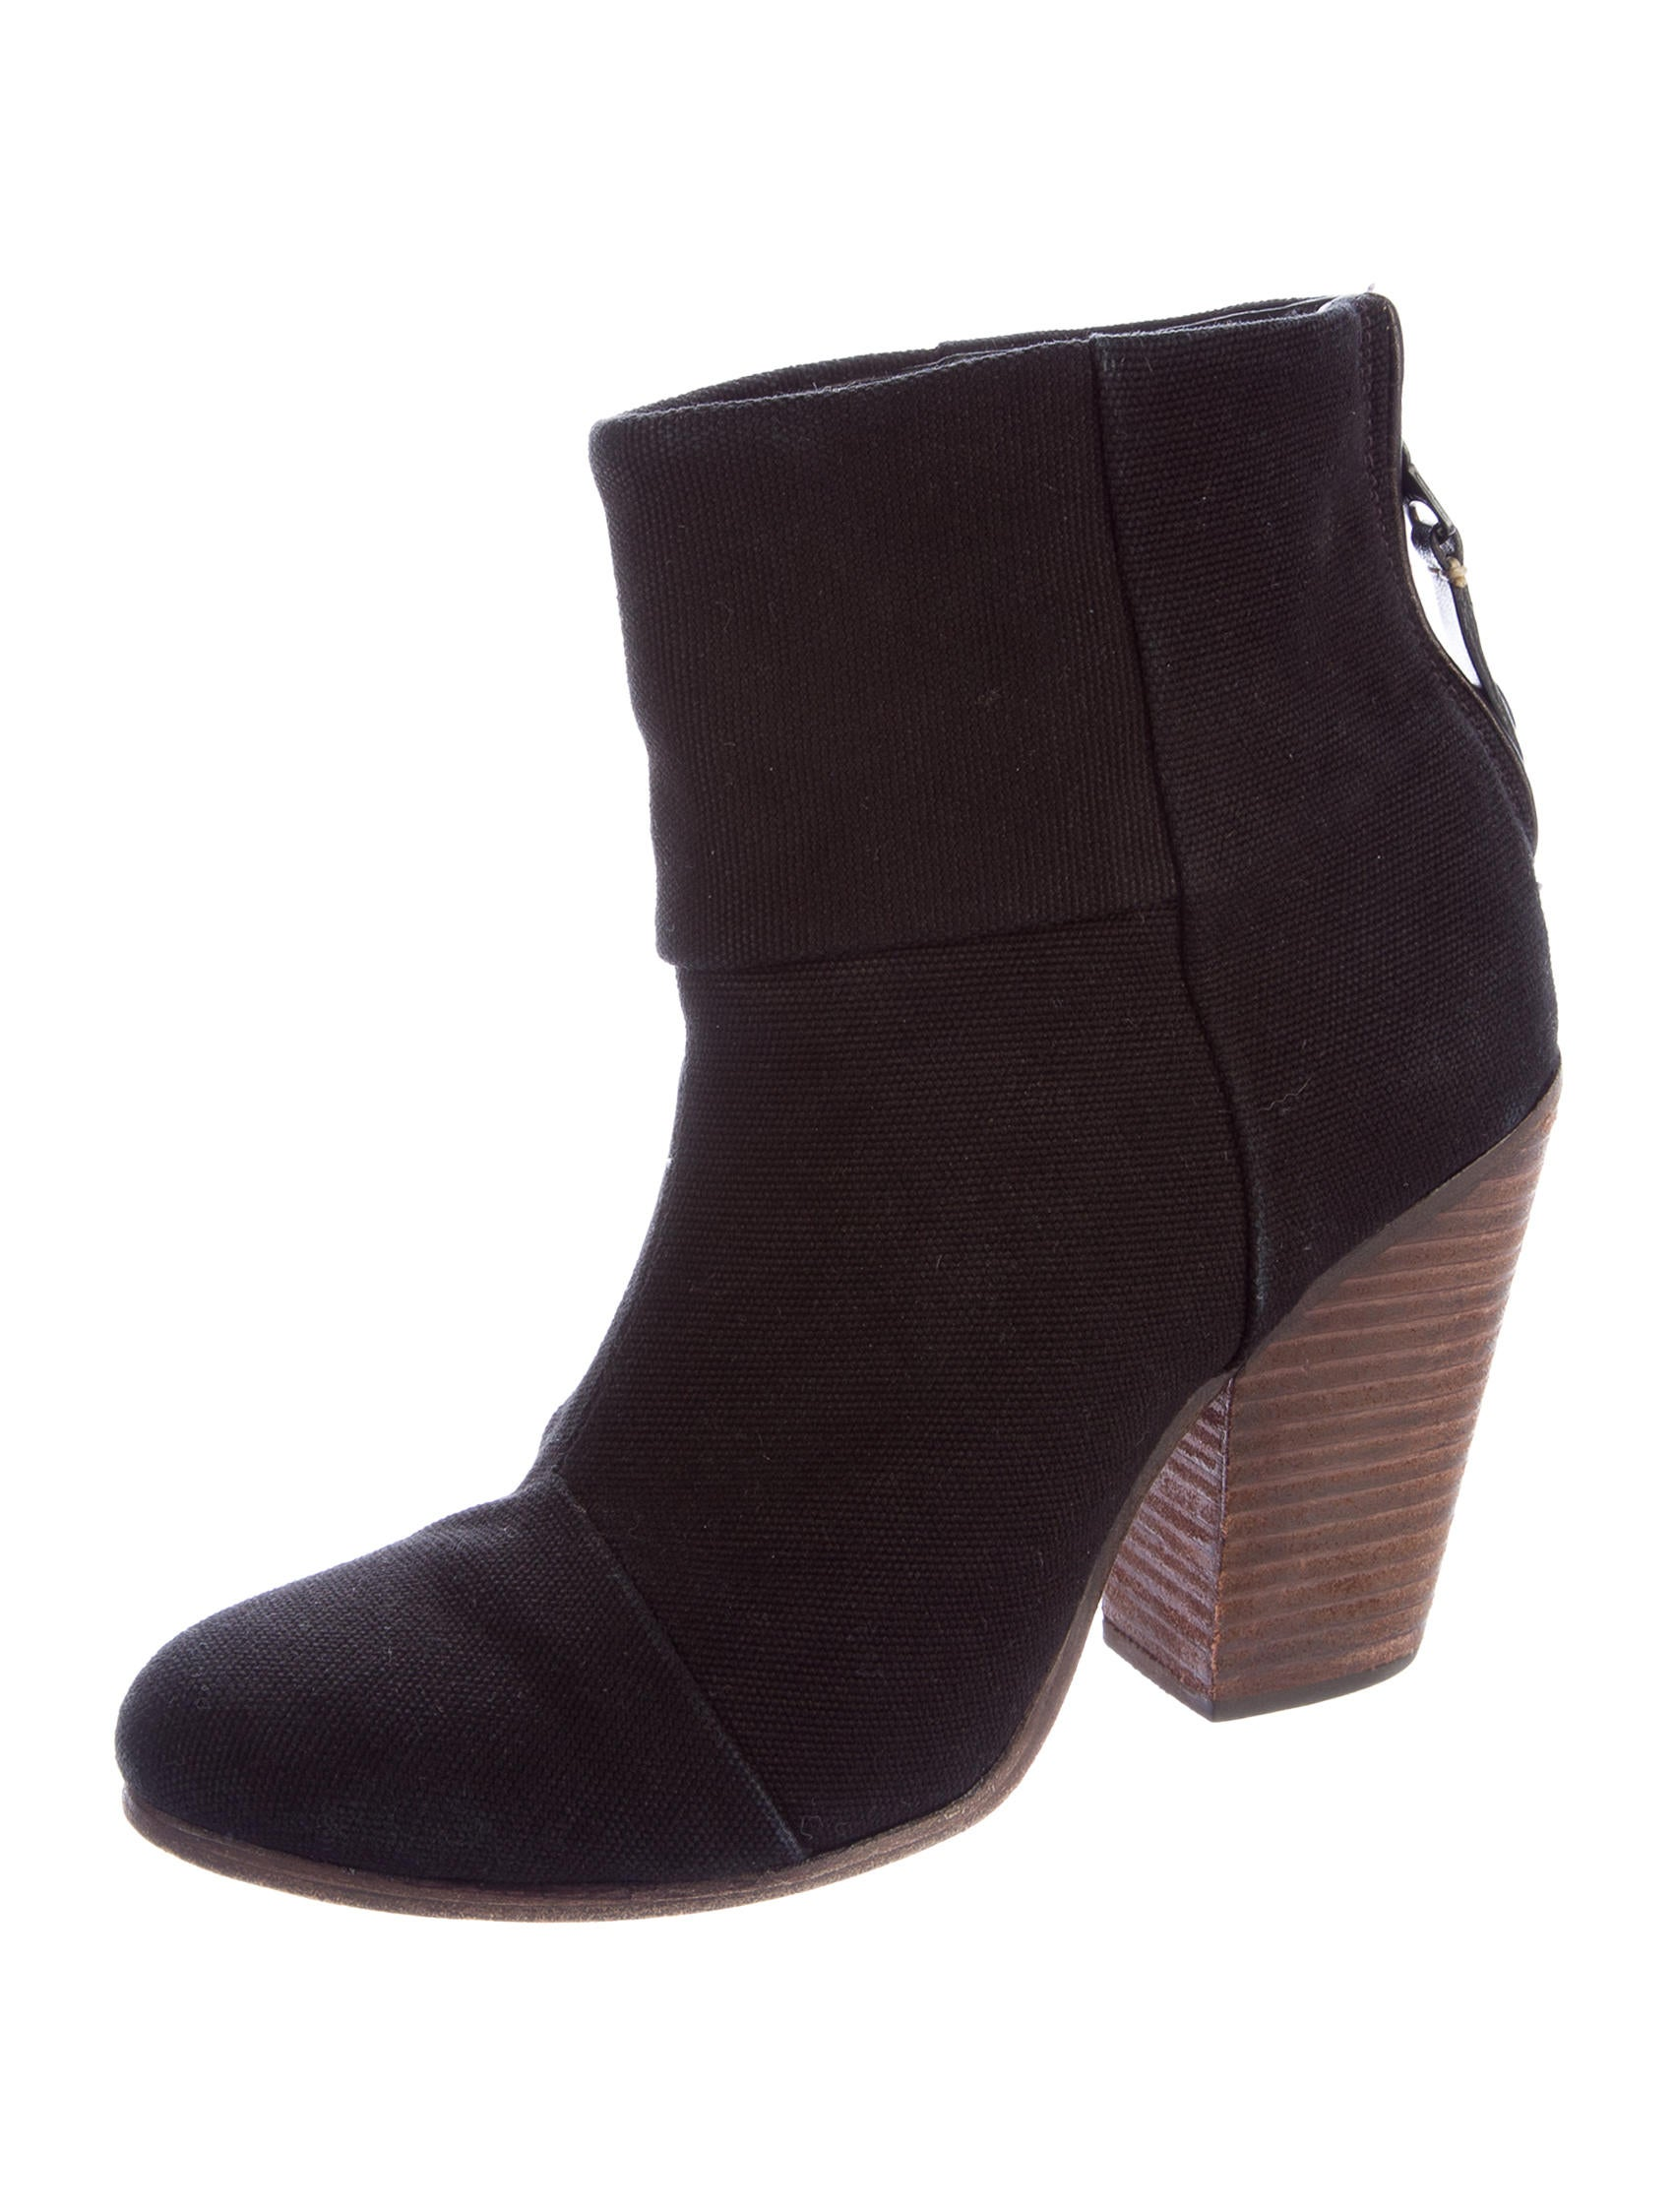 rag bone newbury canvas ankle boots shoes wragb63850